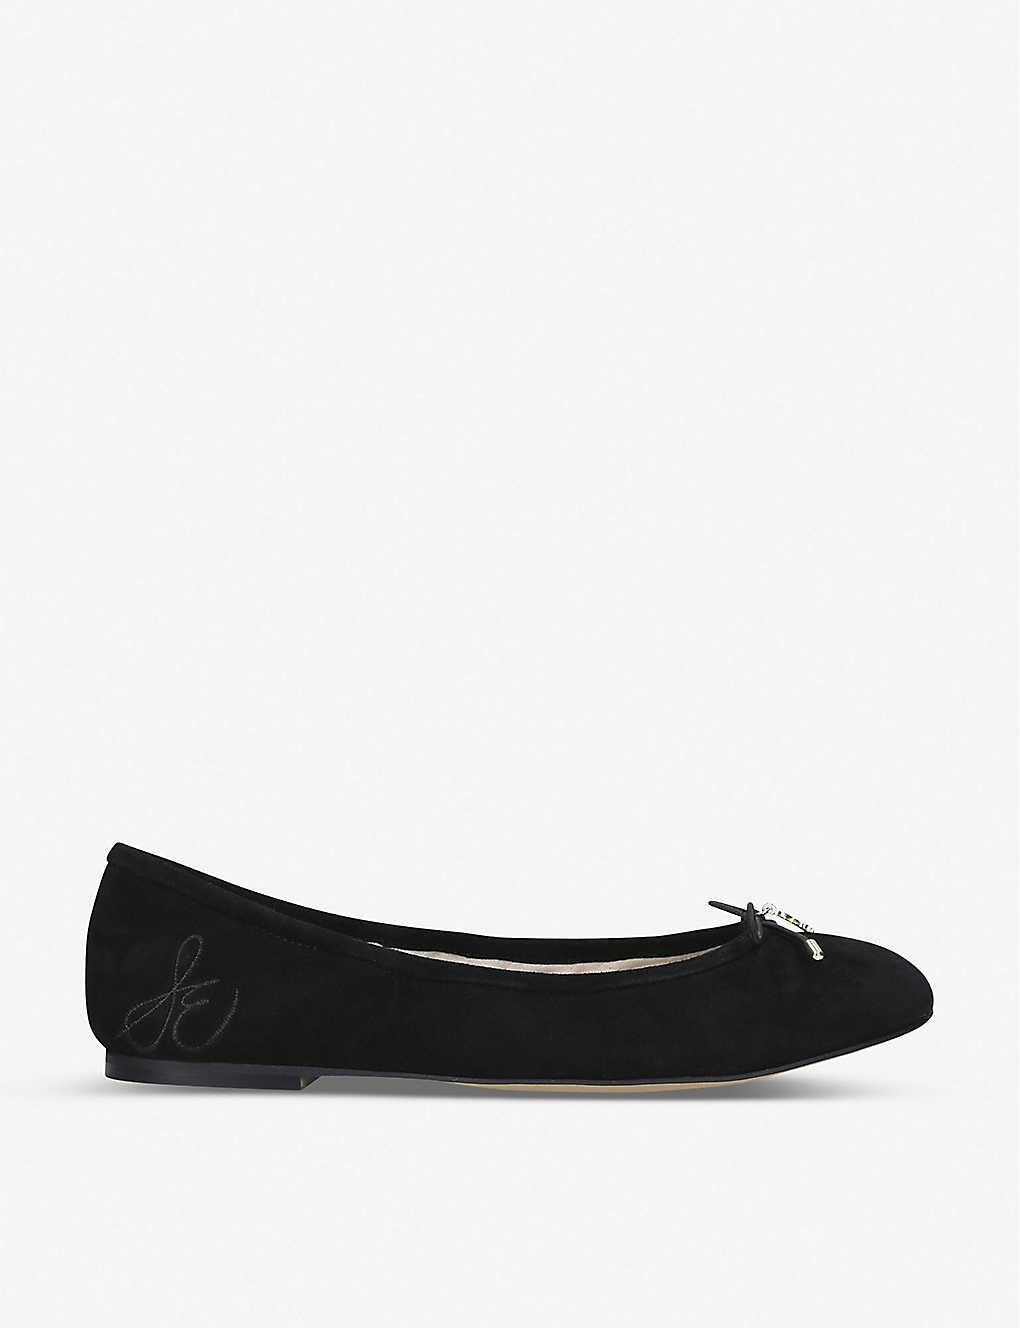 0c6f8987f SAM EDELMAN - Felicia leather ballet flats | Selfridges.com